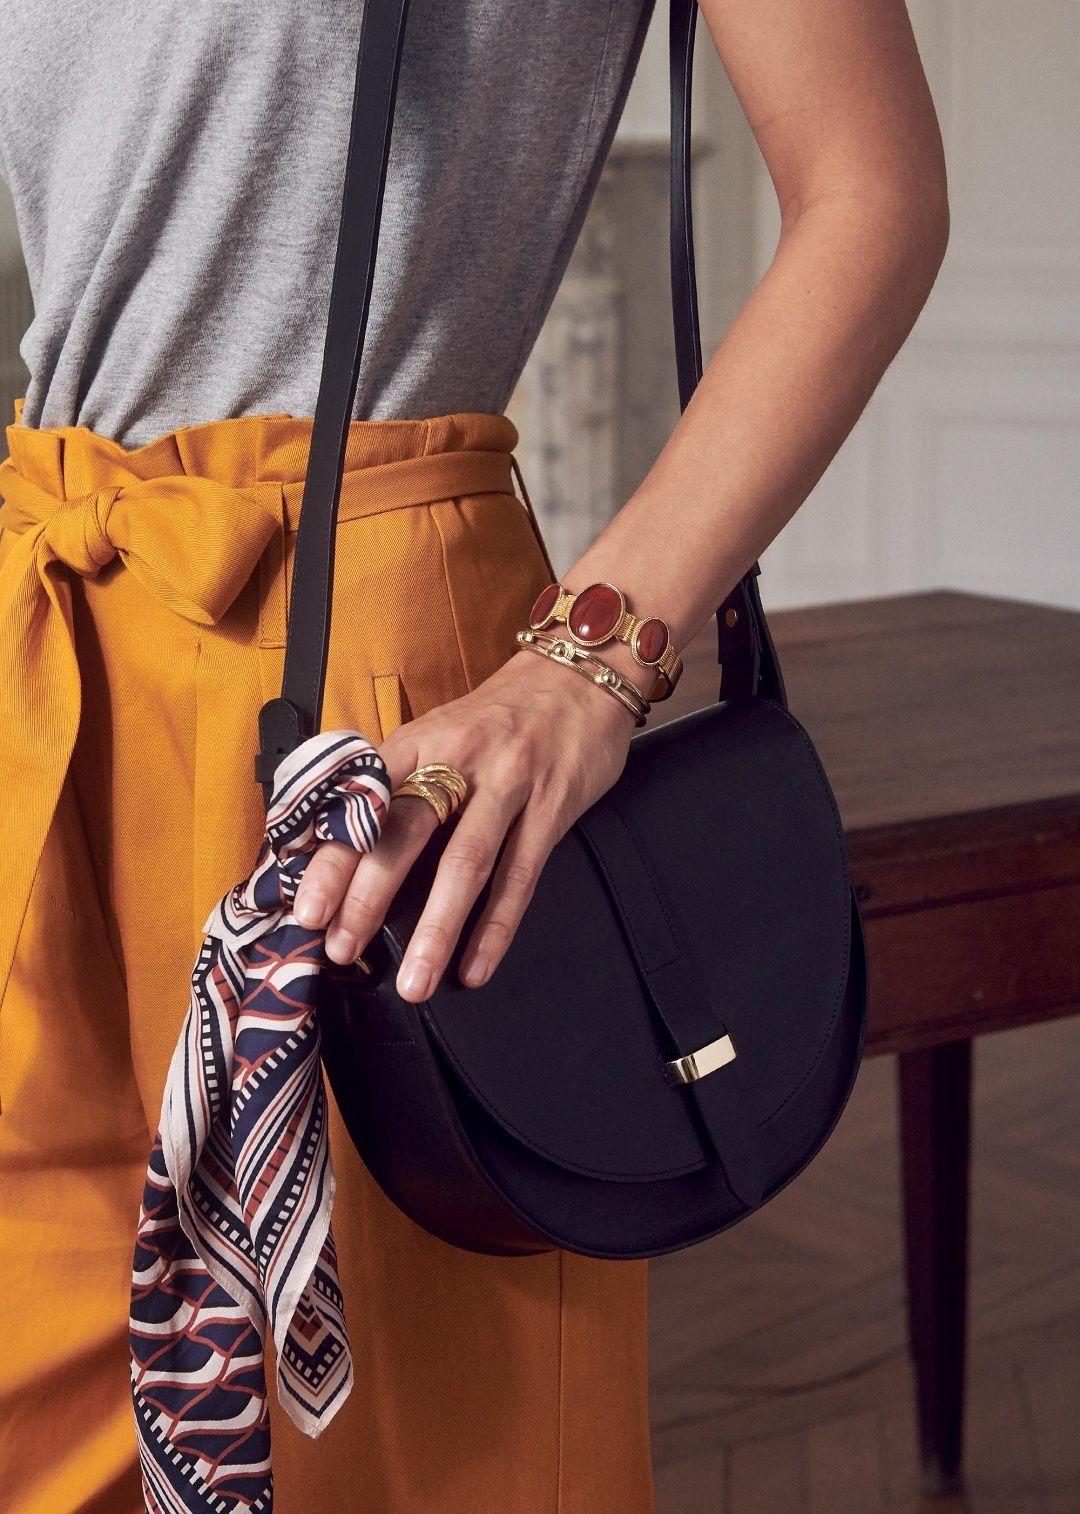 Sézane Claude bag (With images) | Bags, Bag patches